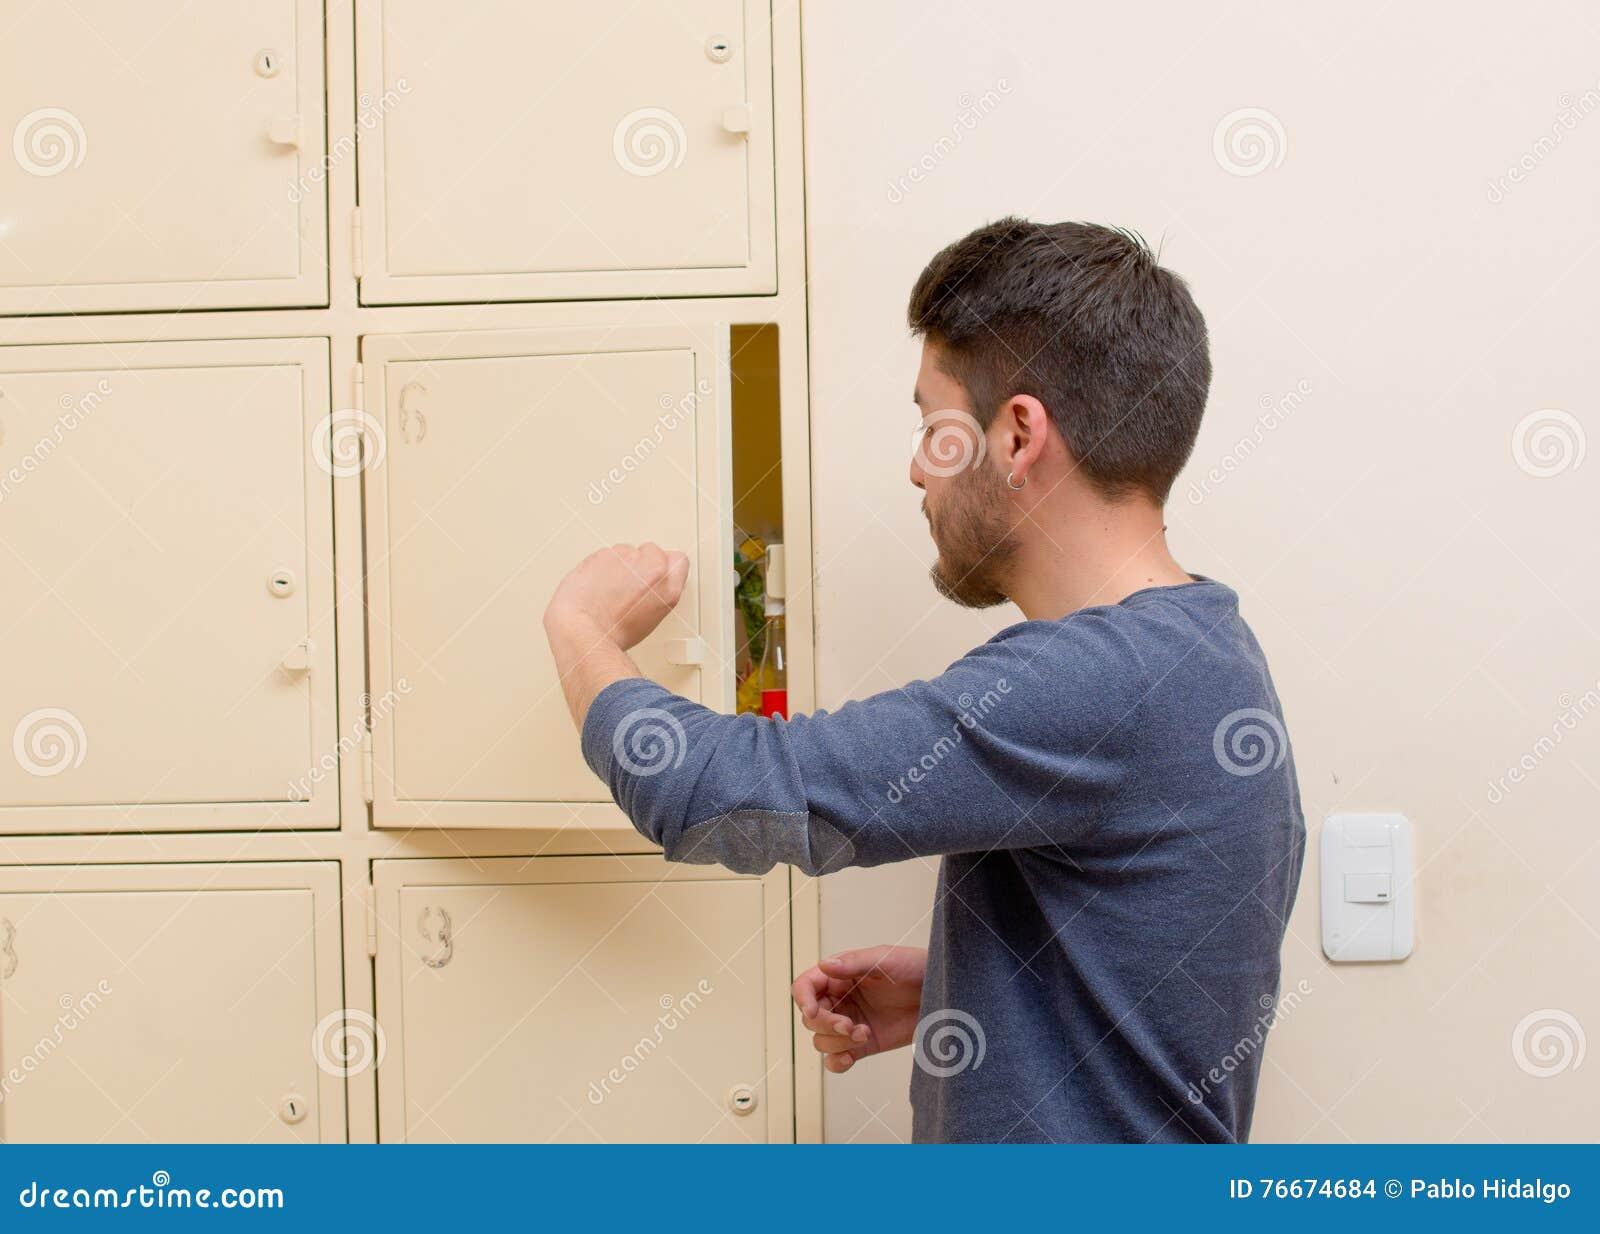 how to open my locker at school